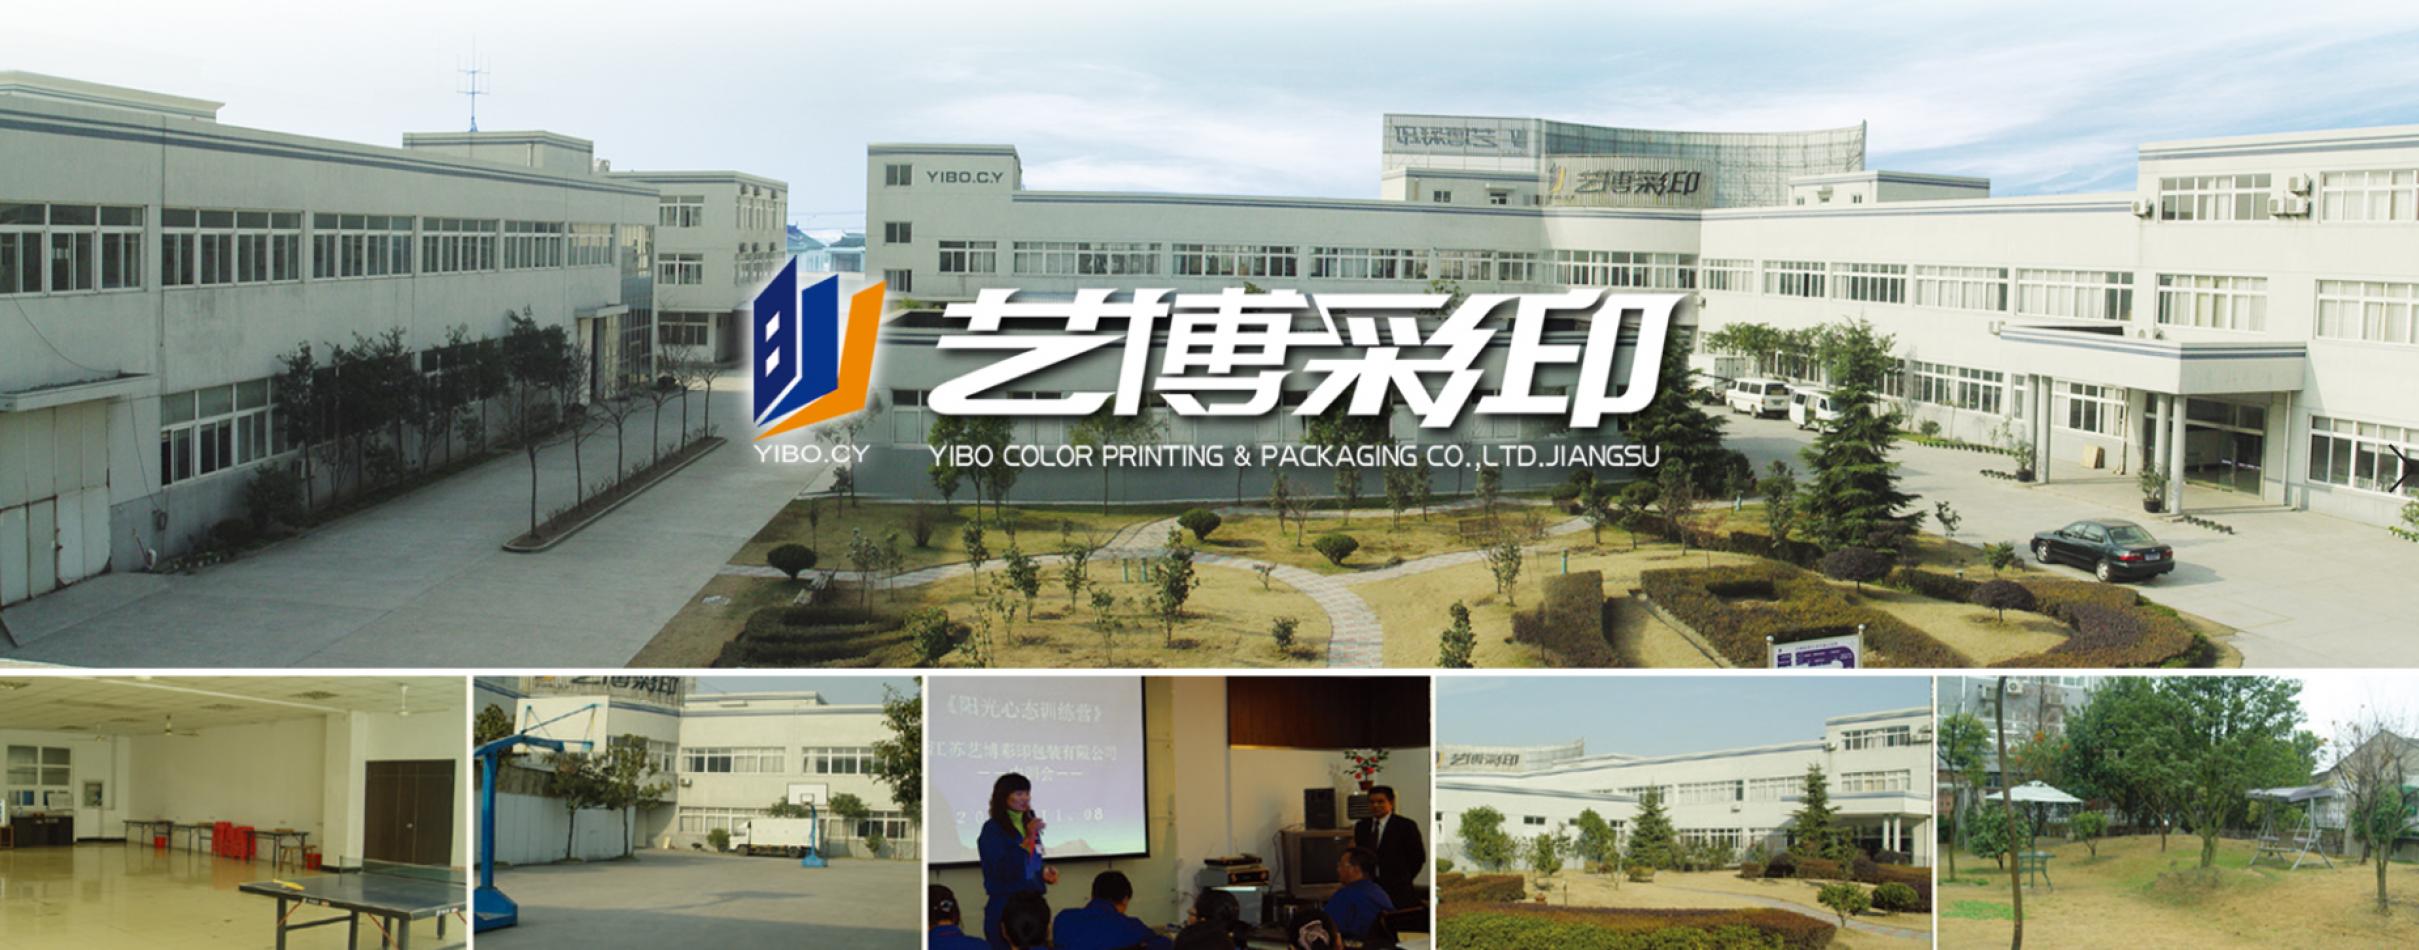 Jiangsu Yibo Color Printing & Packaging Co.,Ltd